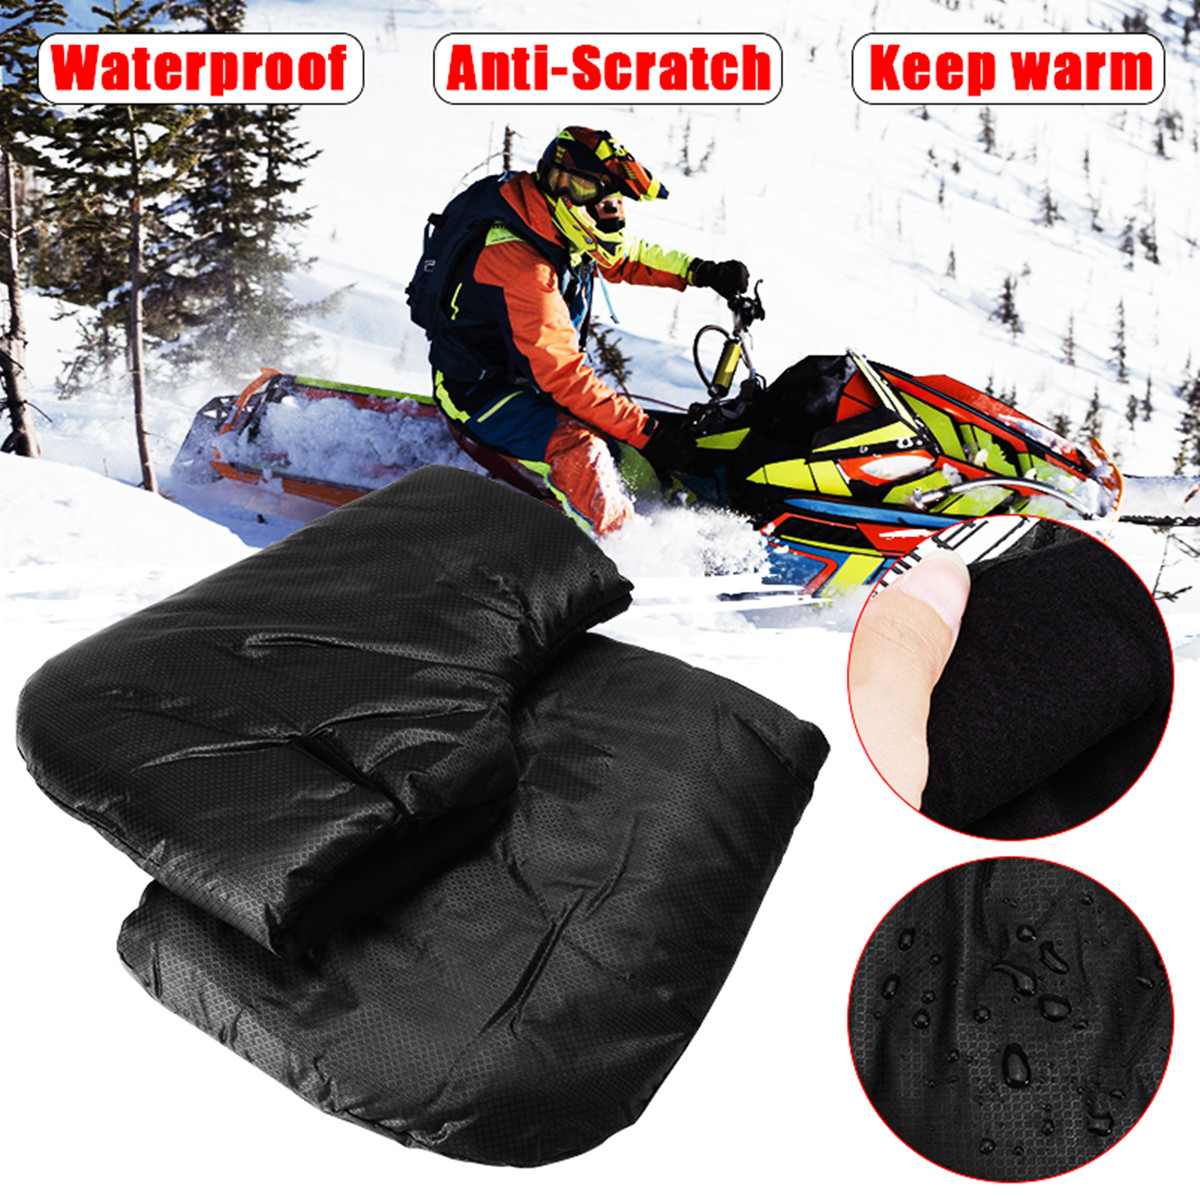 Motorcycle Gloves Handlebar Levers Gloves Scooter Hand Bar Winter Gloves ATV Fur Mitts Motorbike Quad Bike Waterproof